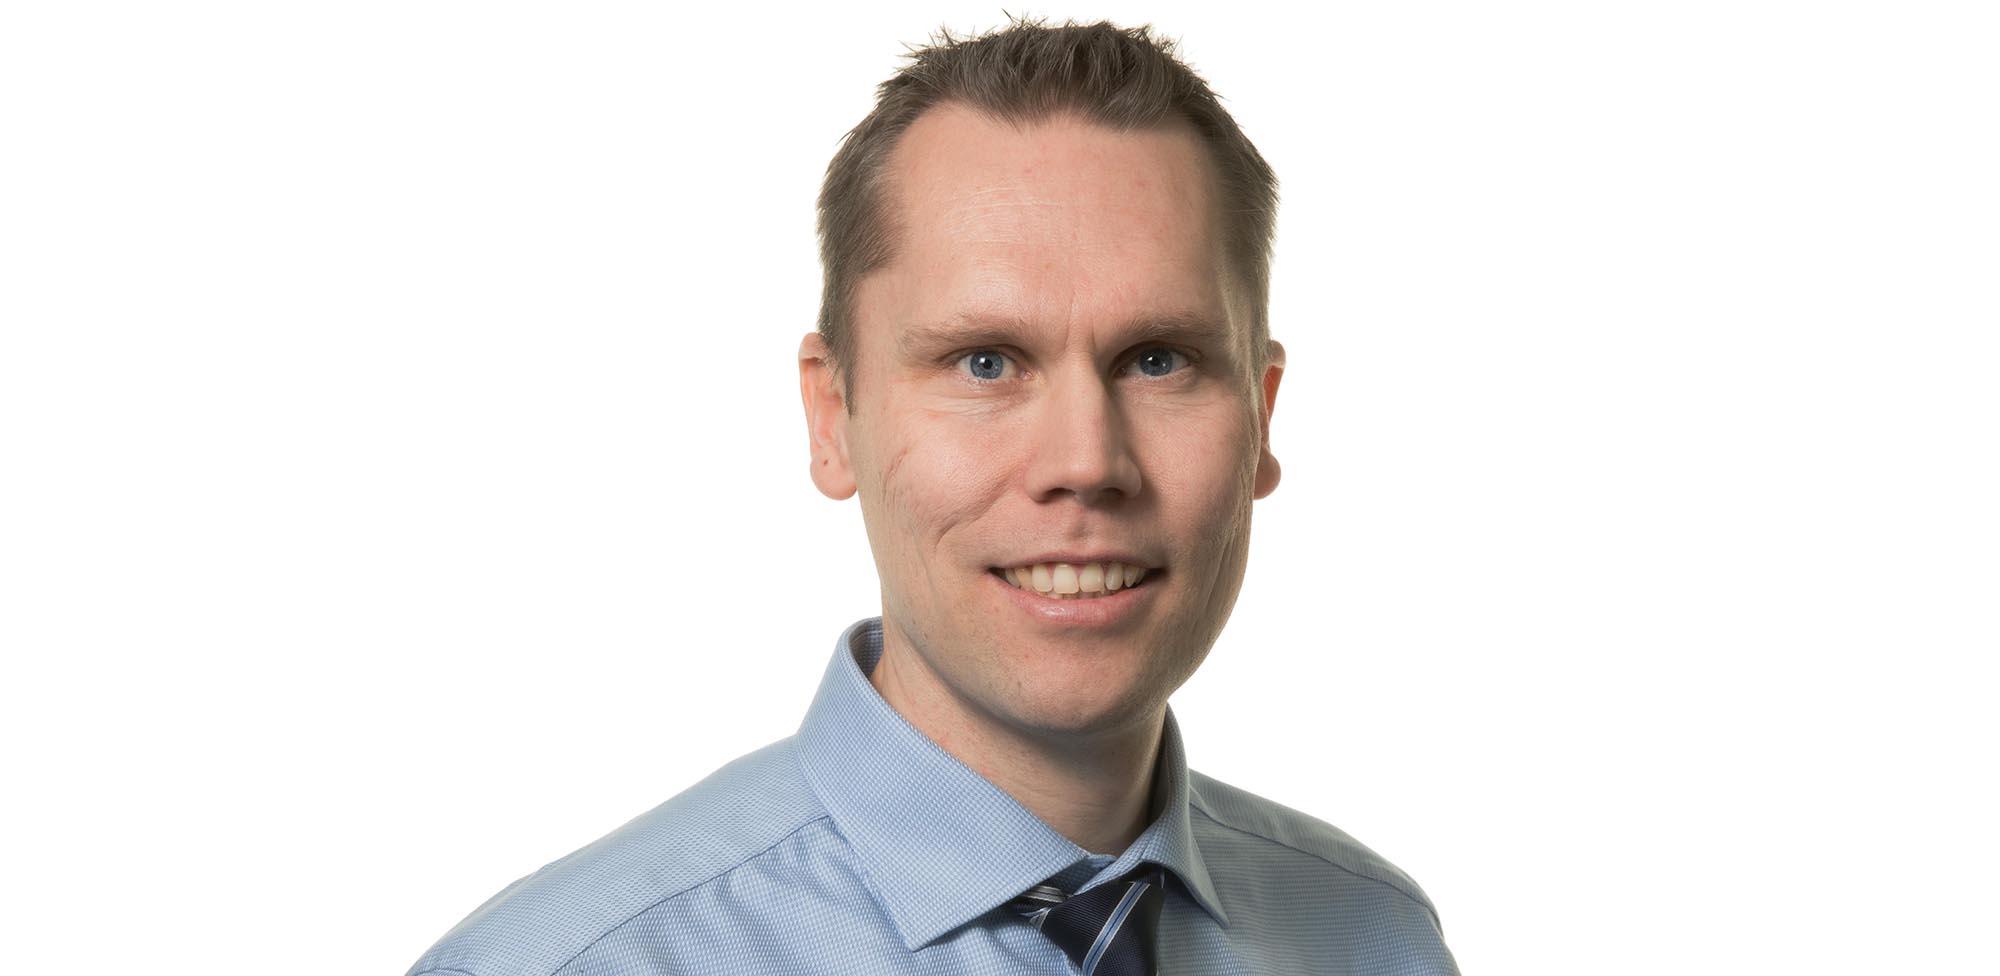 Johan Grunditz